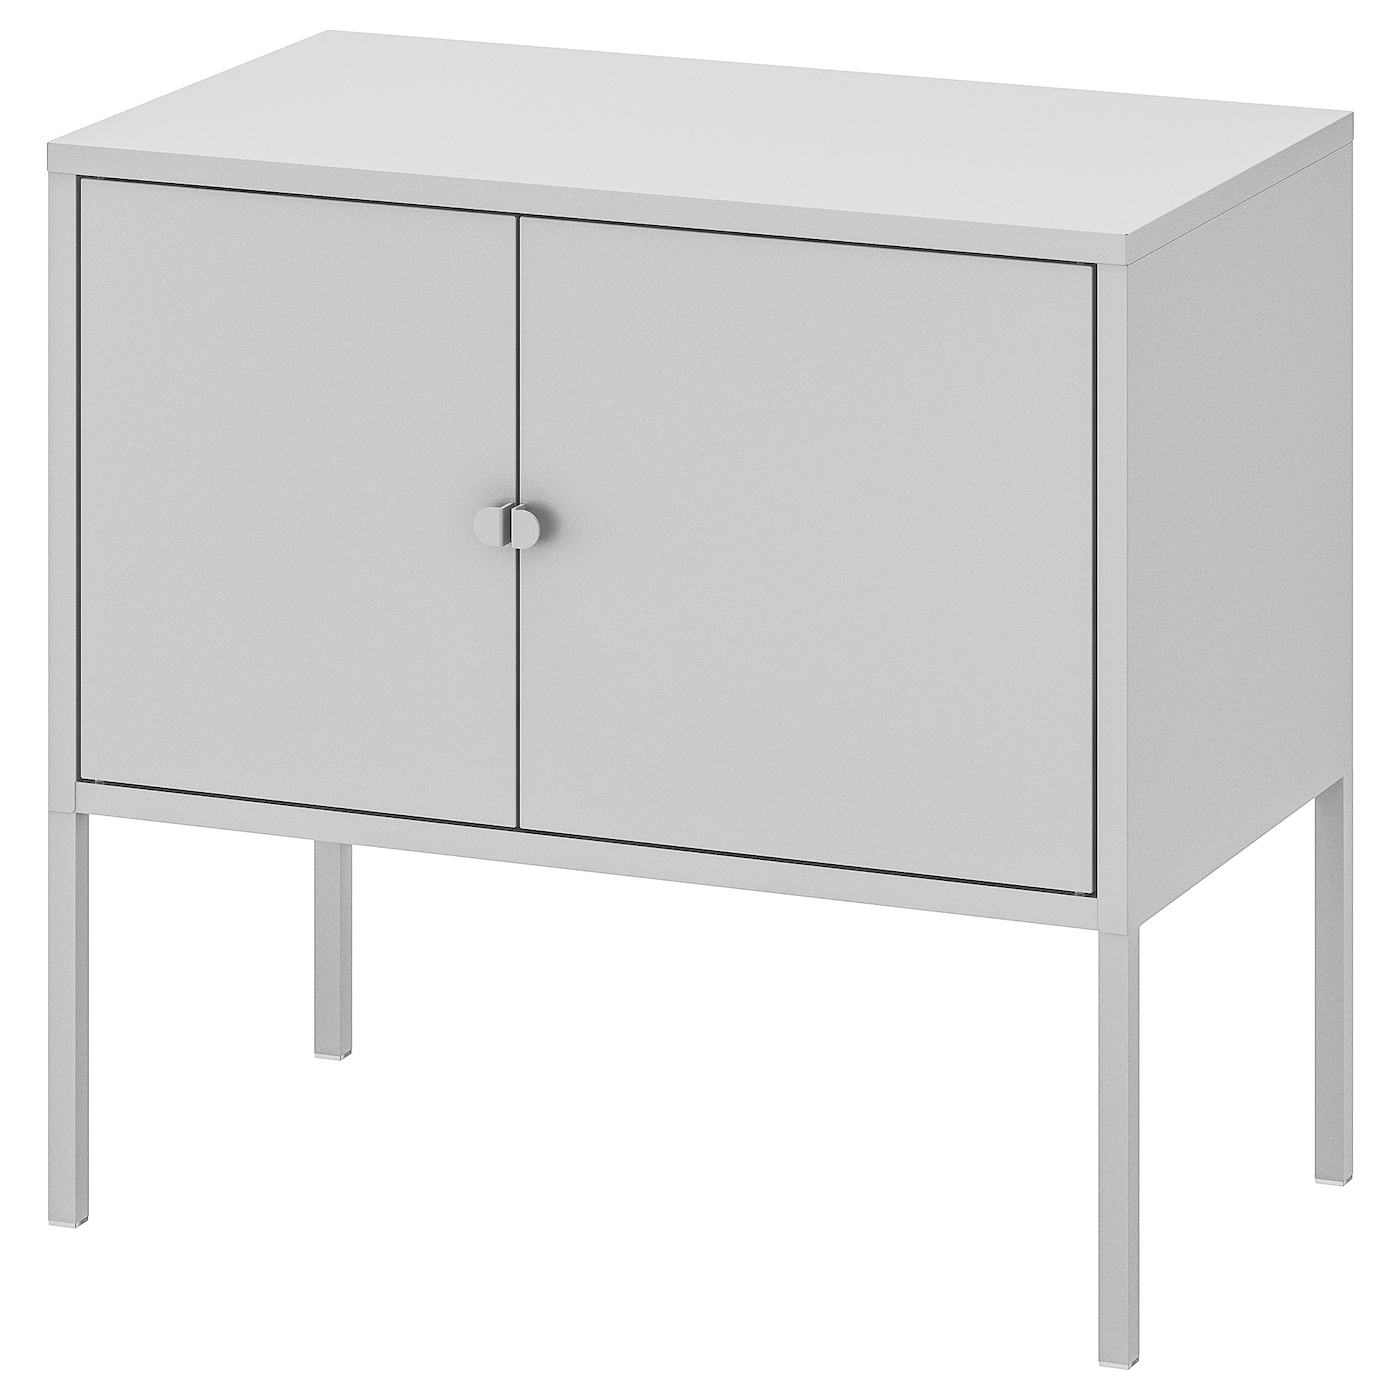 lixhult cabinet metal/grey 60 x 35 cm - ikea